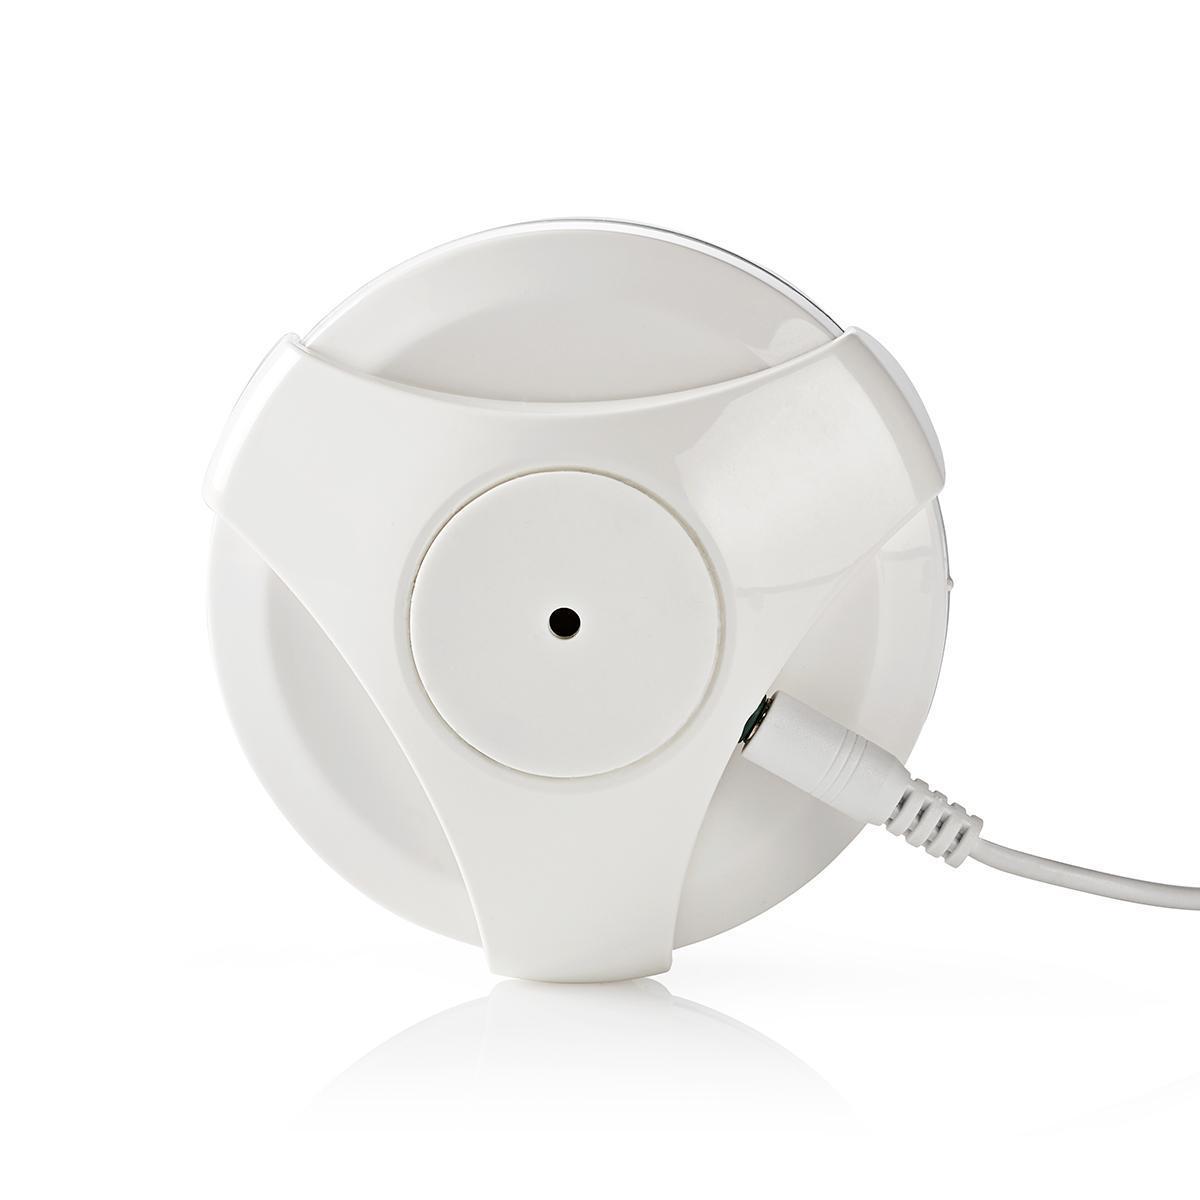 Detector Inteligente de Fugas de Agua con Wi Fi